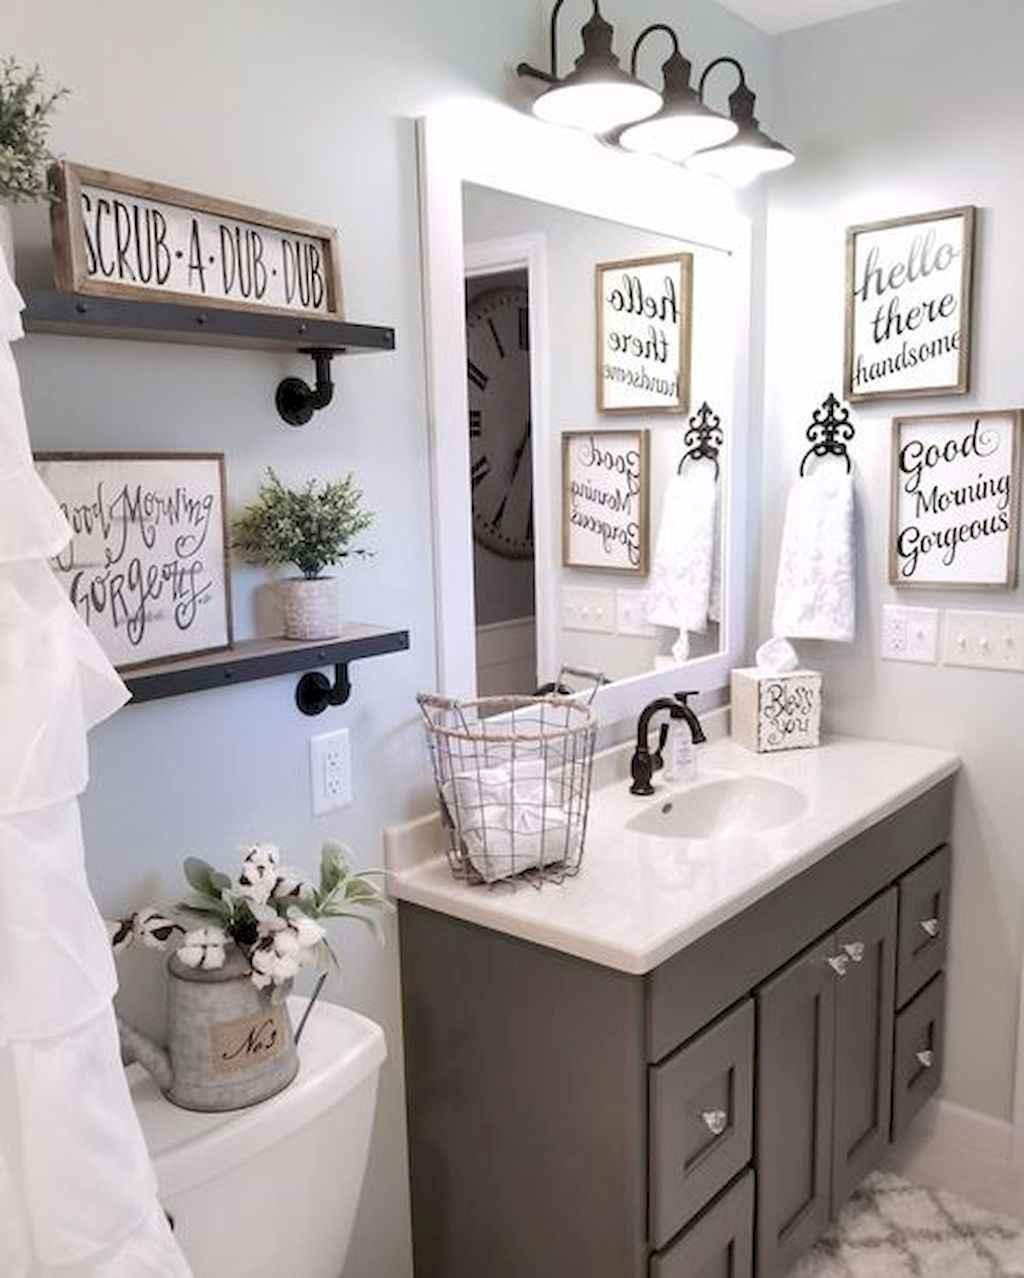 50 Rustic Farmhouse Master Bathroom Remodel Ideas (47) - Roomadness